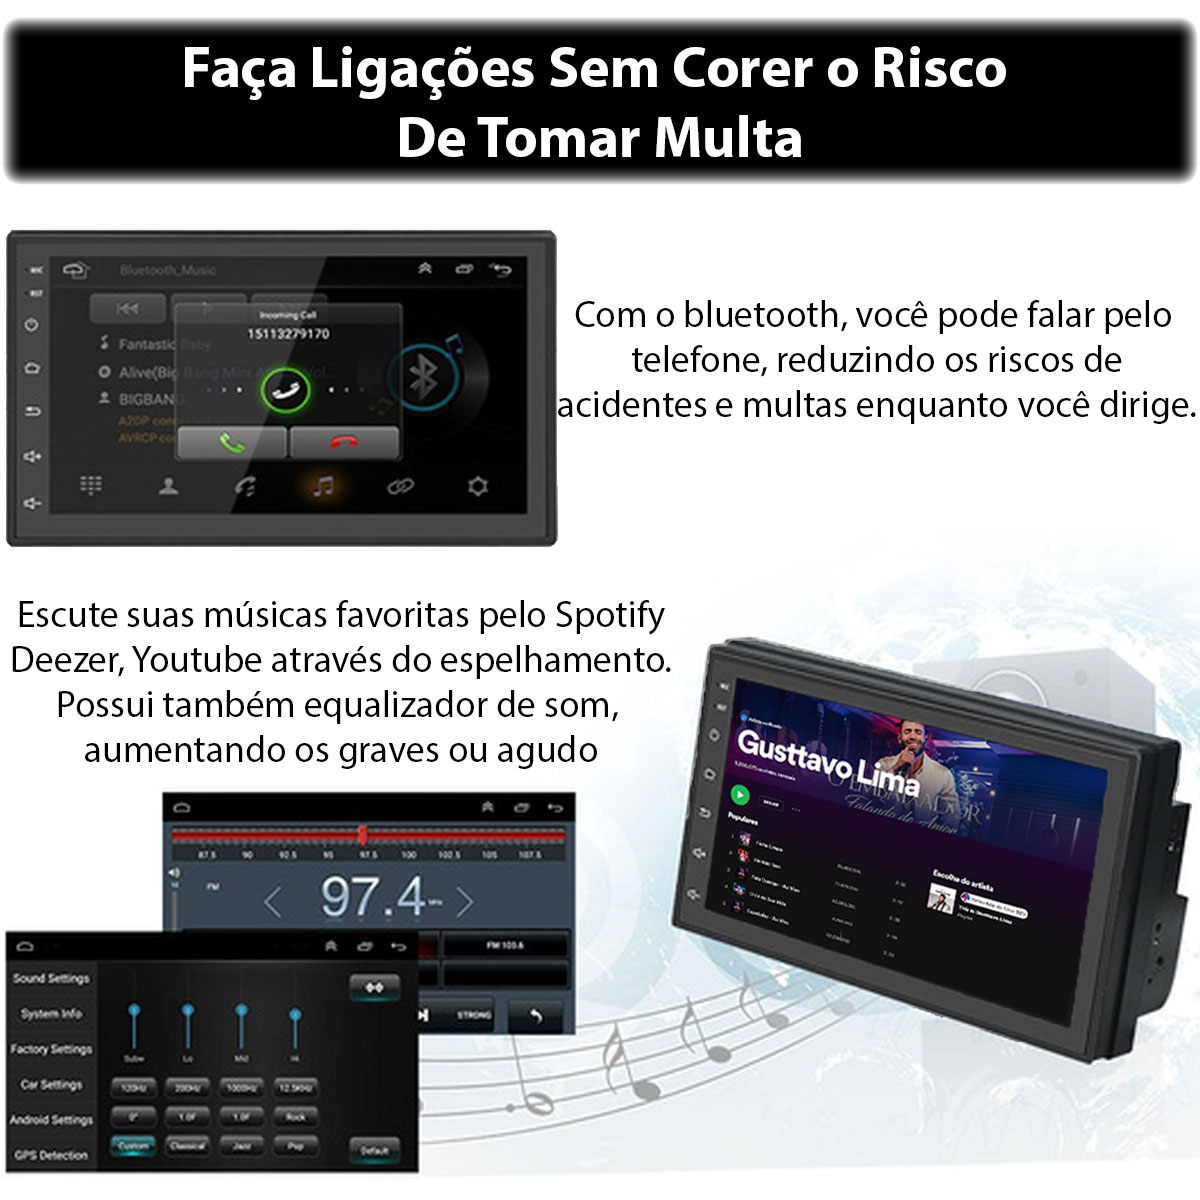 Central Multimídia com Moldura Honda CRV Mp5 Bluetooth Usb Touchscreen 7 Polegadas 2 Din 2012 a 2016 Poliparts